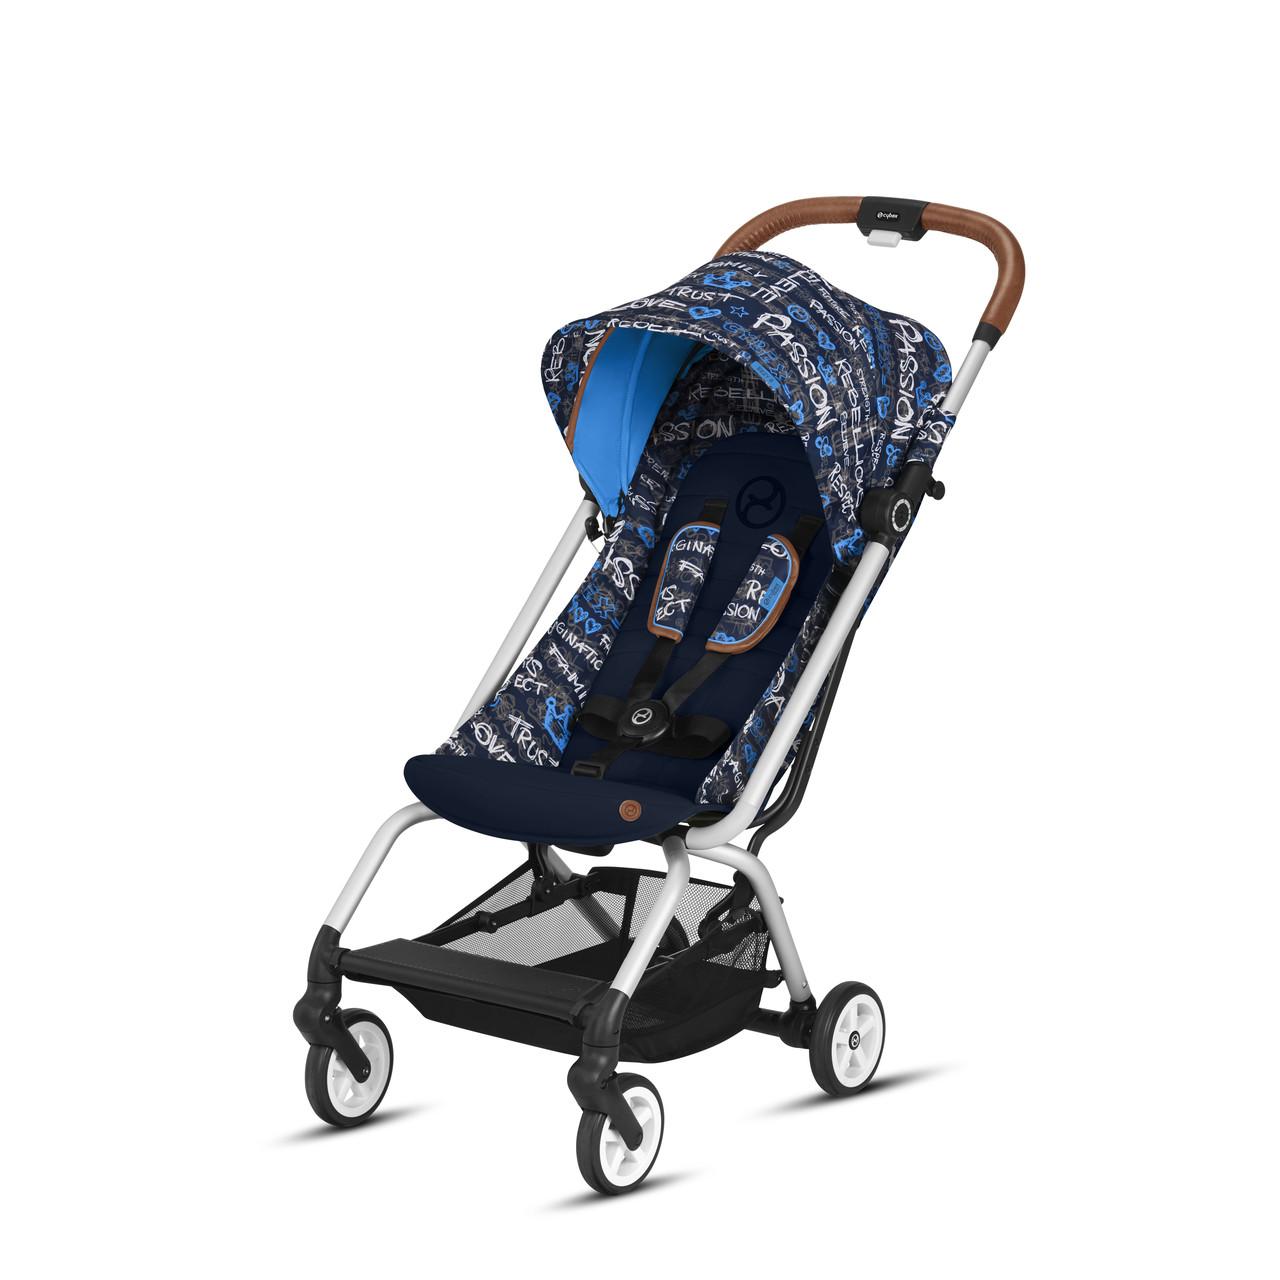 Cybex - Прогулочная коляска Eezy S Values for life, цвет Trust blue